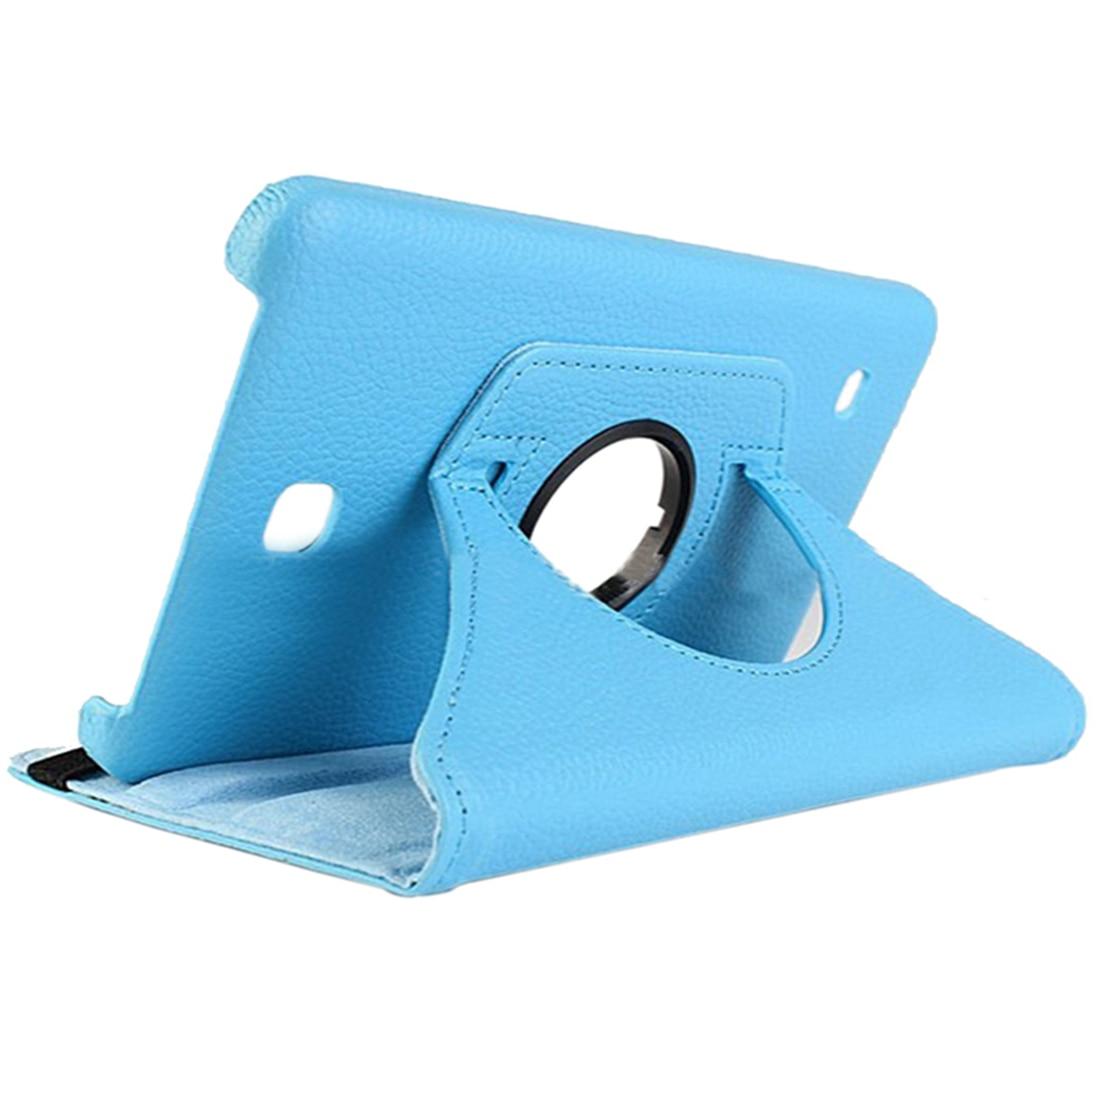 Cases For Samsung Galaxy Tab 4 Tablet SM-T230 SM-T231 360 degree Rotation Housing чехол для планшета 0asis samsung tab4 t230 t230 7 for galaxy tab 4 t230